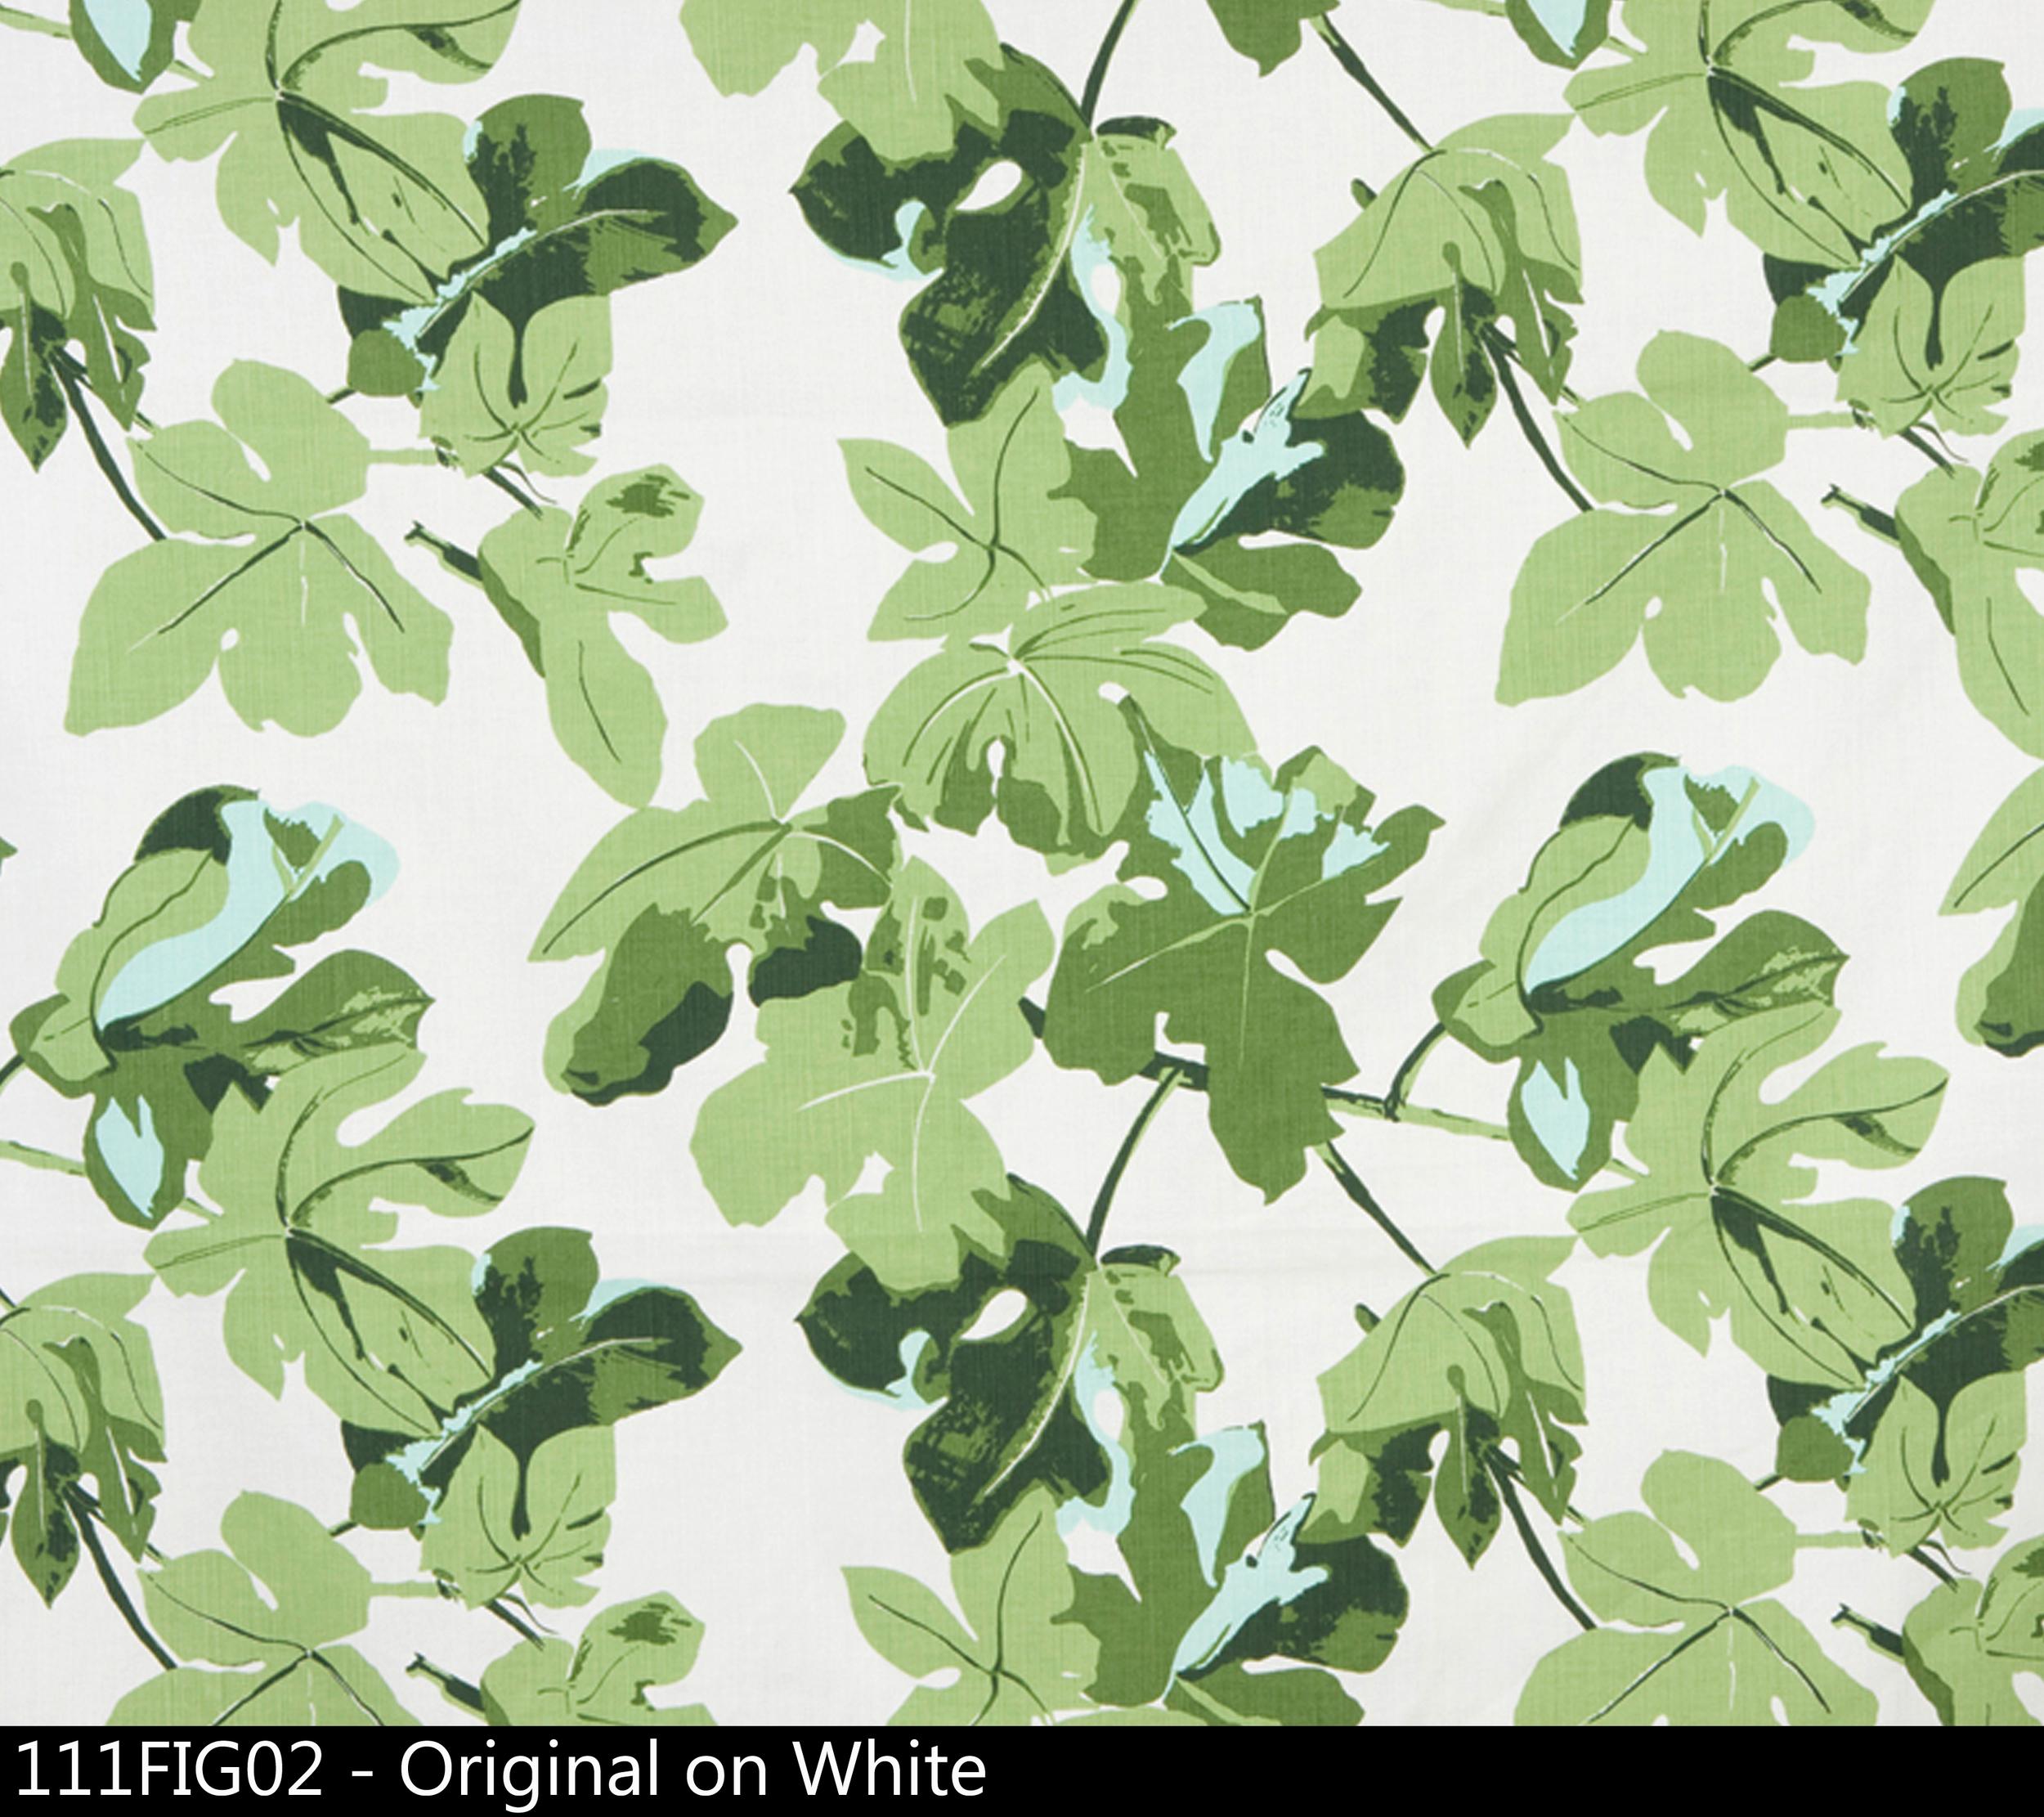 Fig Leaf Original on White.jpg